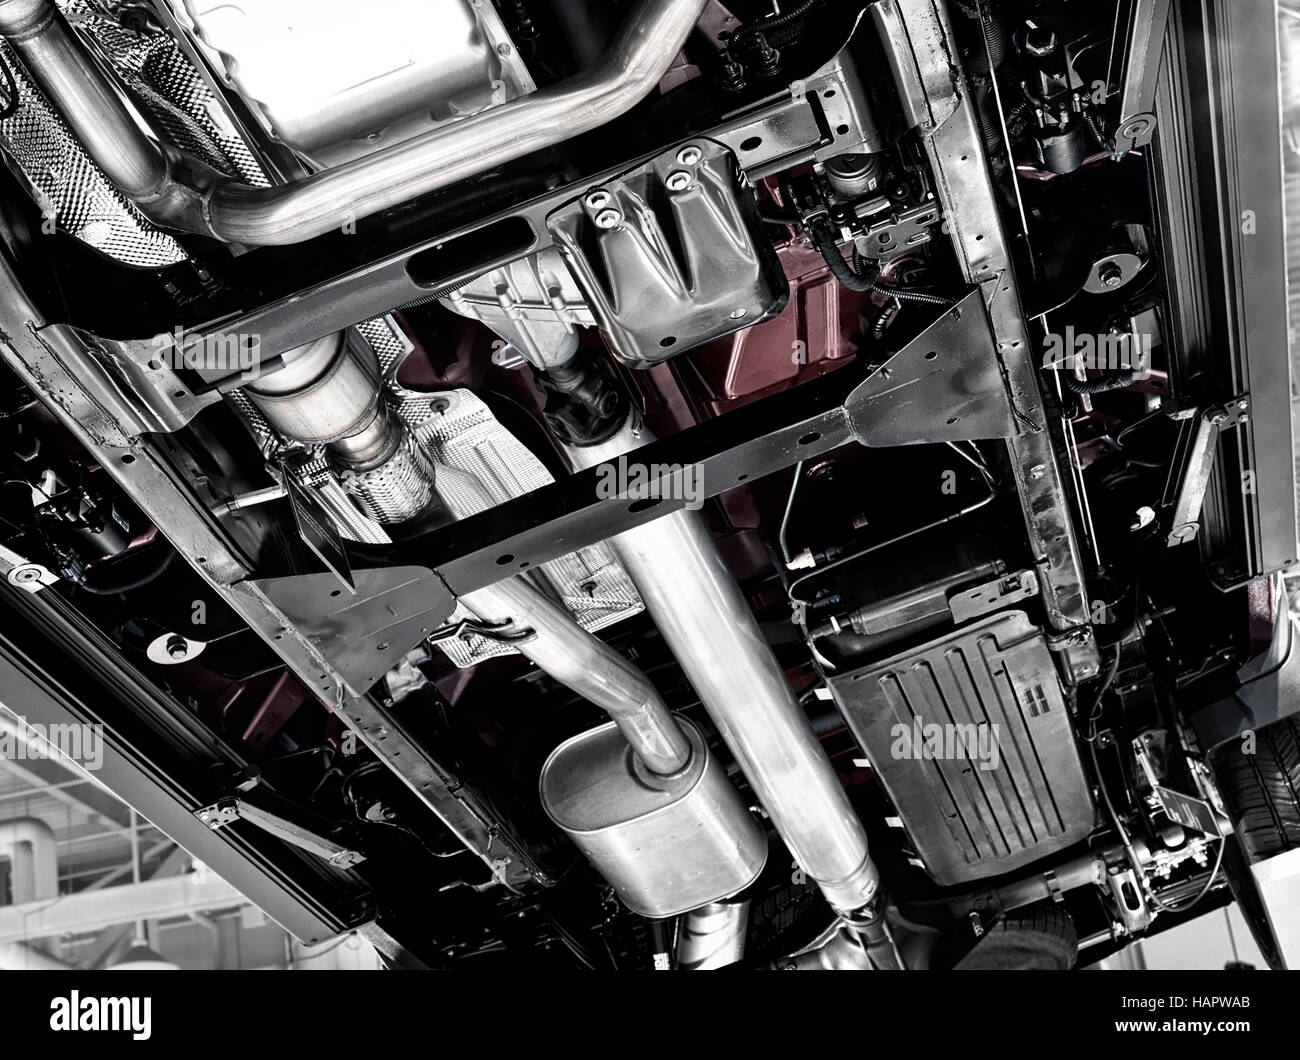 2017 Chevrolet Silverado 1500 Pickup Truck Unterseite Unterseite